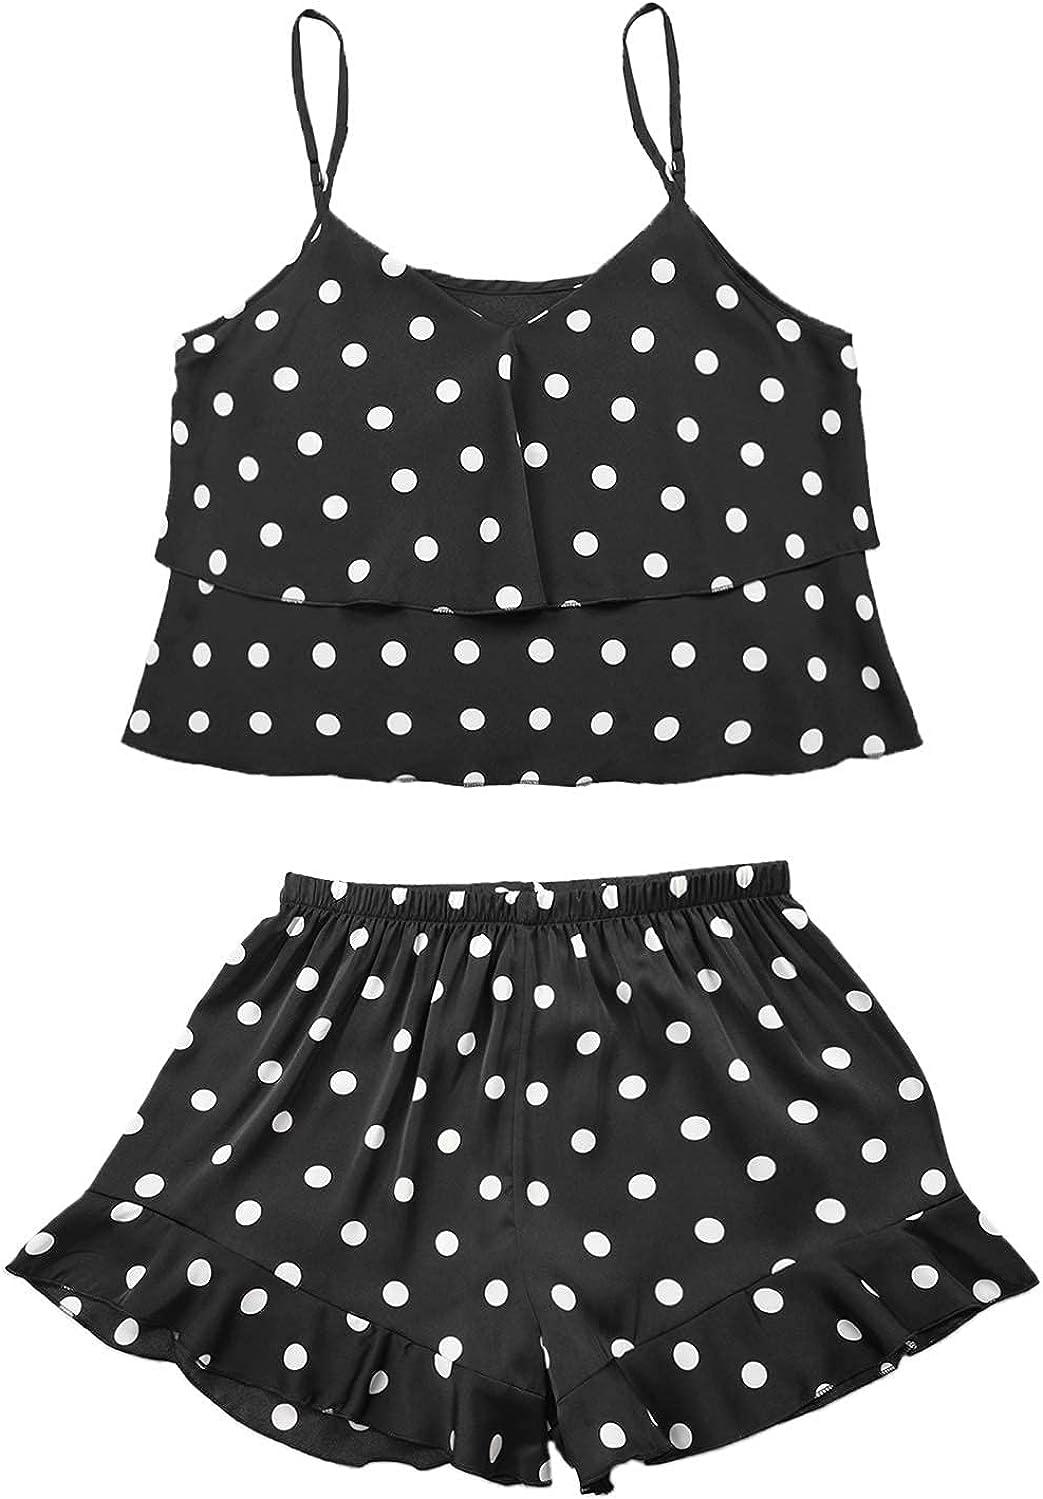 ninovino Women's Sexy Lingerie Pajamas Set Cami Shorts with Polka Dot Lounge Sleepwear Nightwear